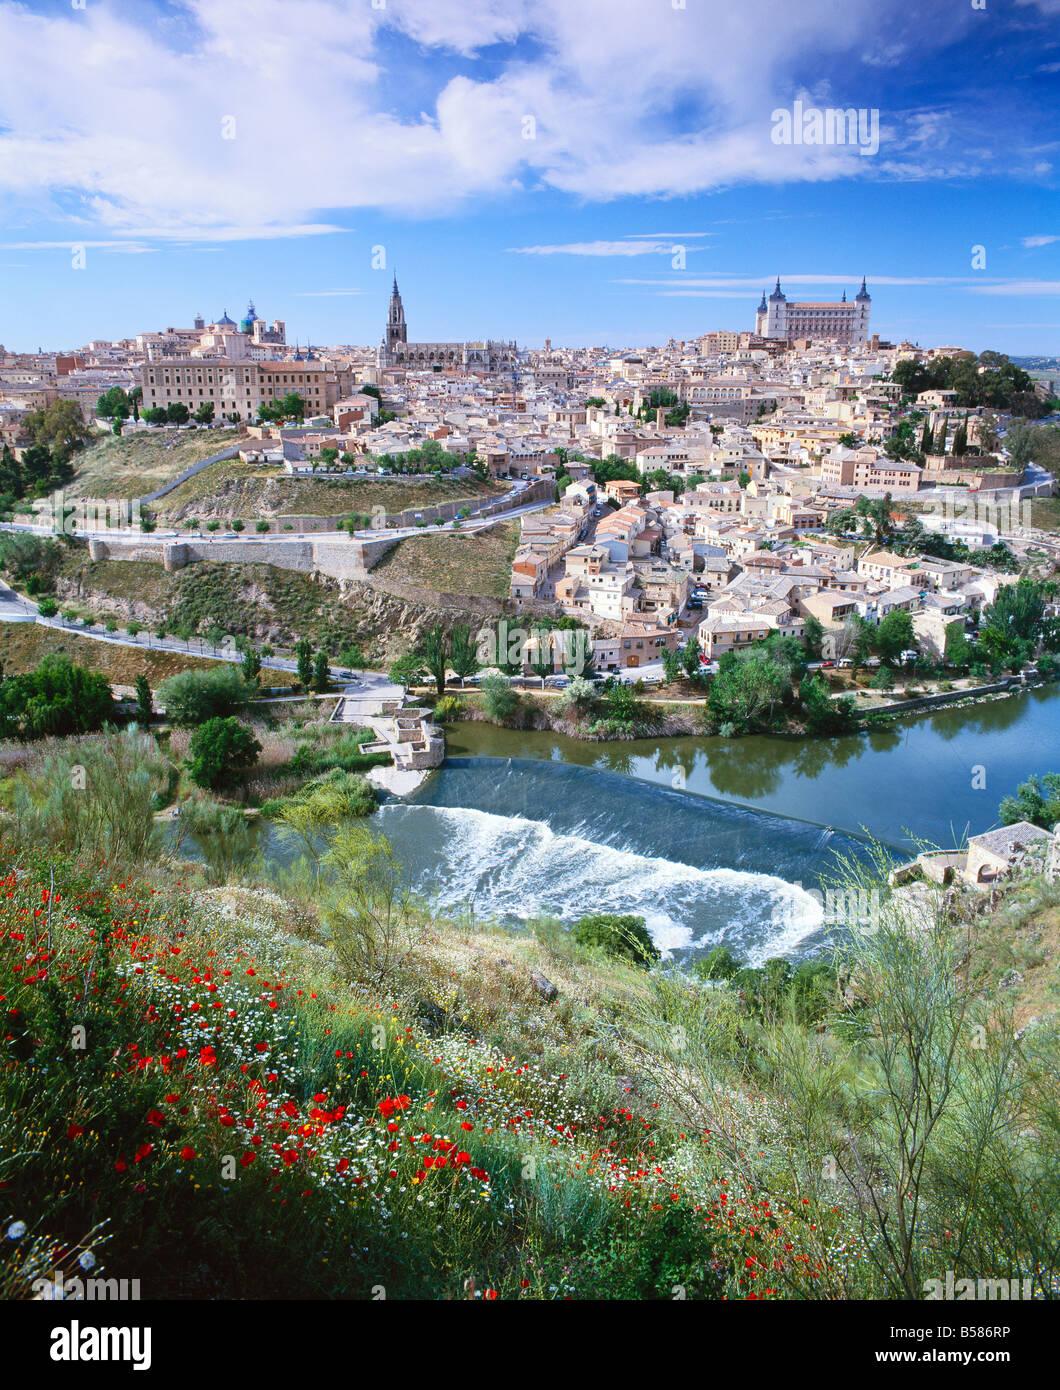 Toledo, Castilla La Mancha (New Castile), Spain, Europe - Stock Image